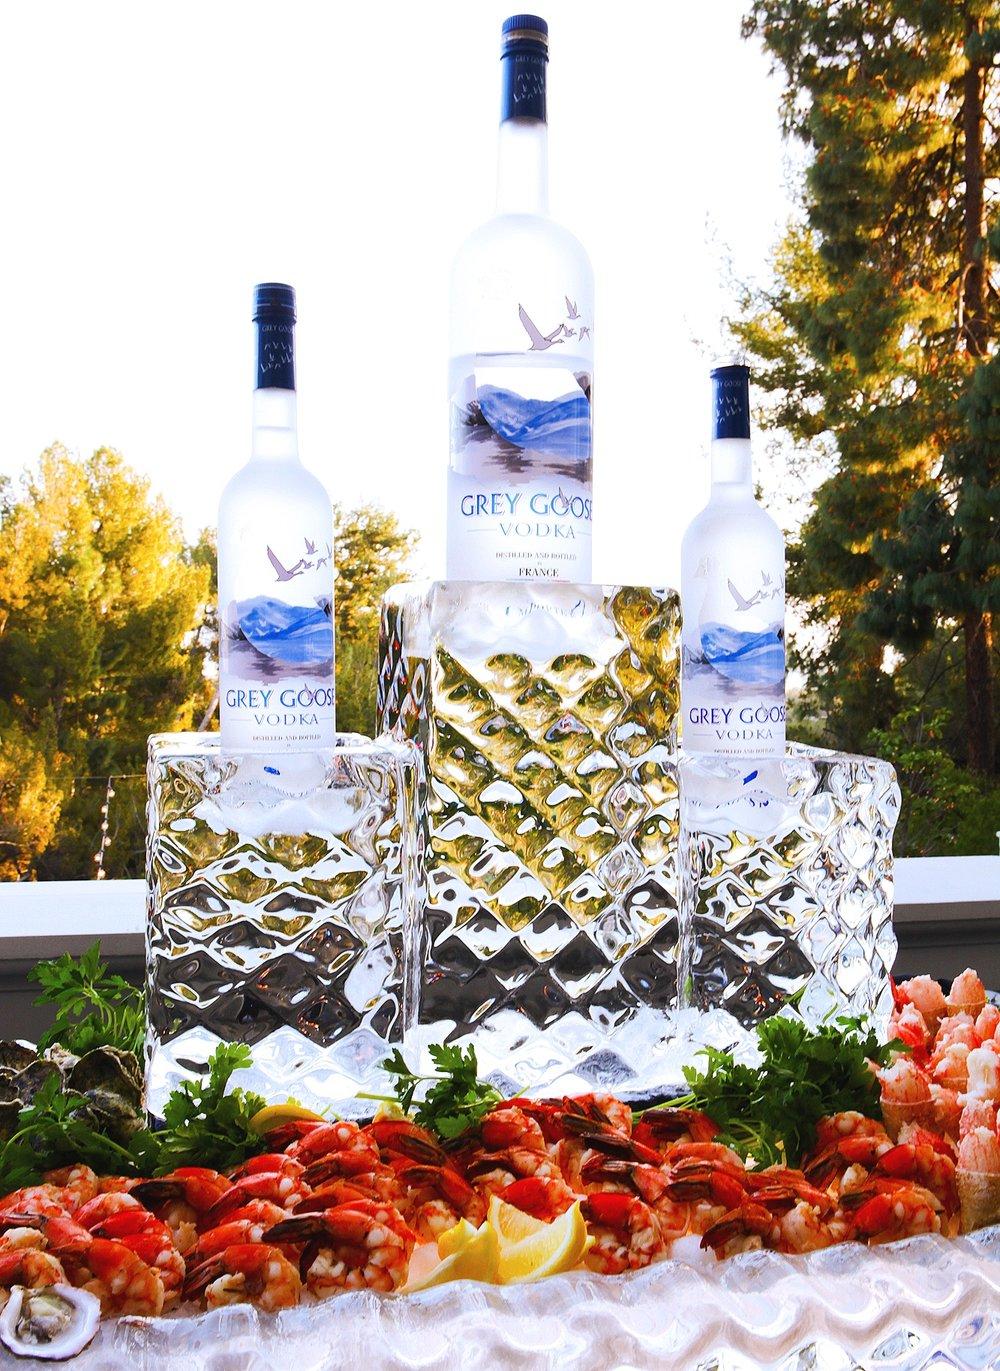 Seafood and vodka display